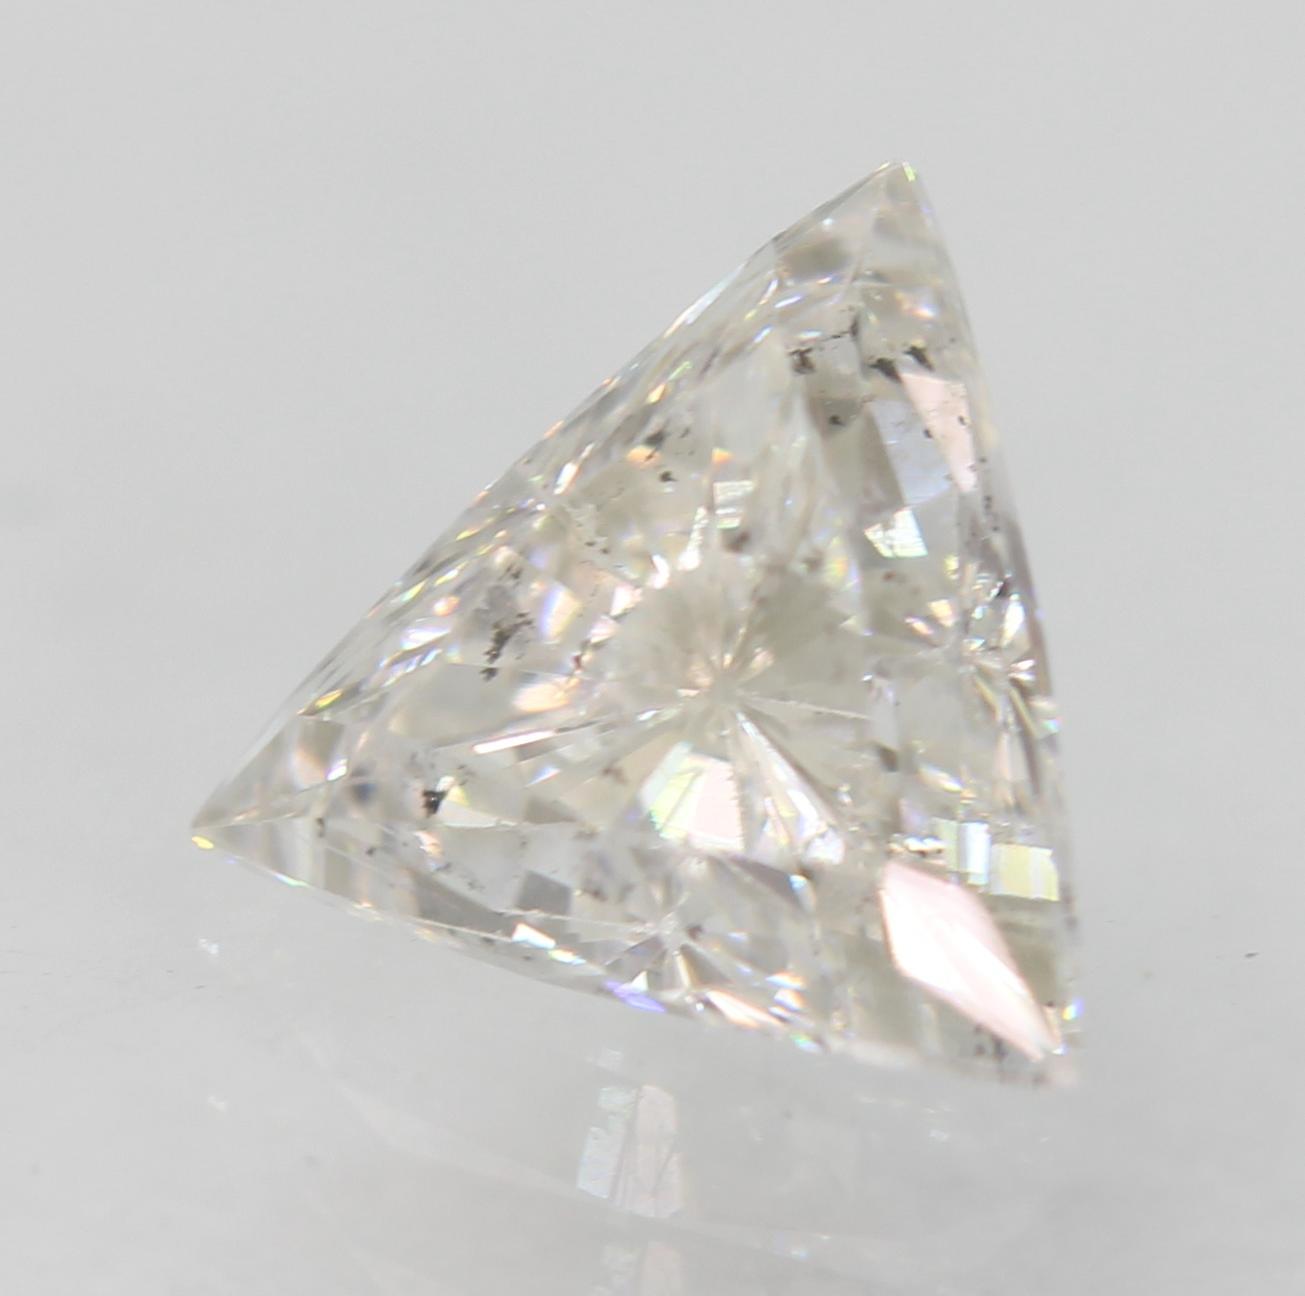 Certified 0.59 Carat E VS2 Triangle Enhanced Natural Loose Diamond 5.75x5.75mm